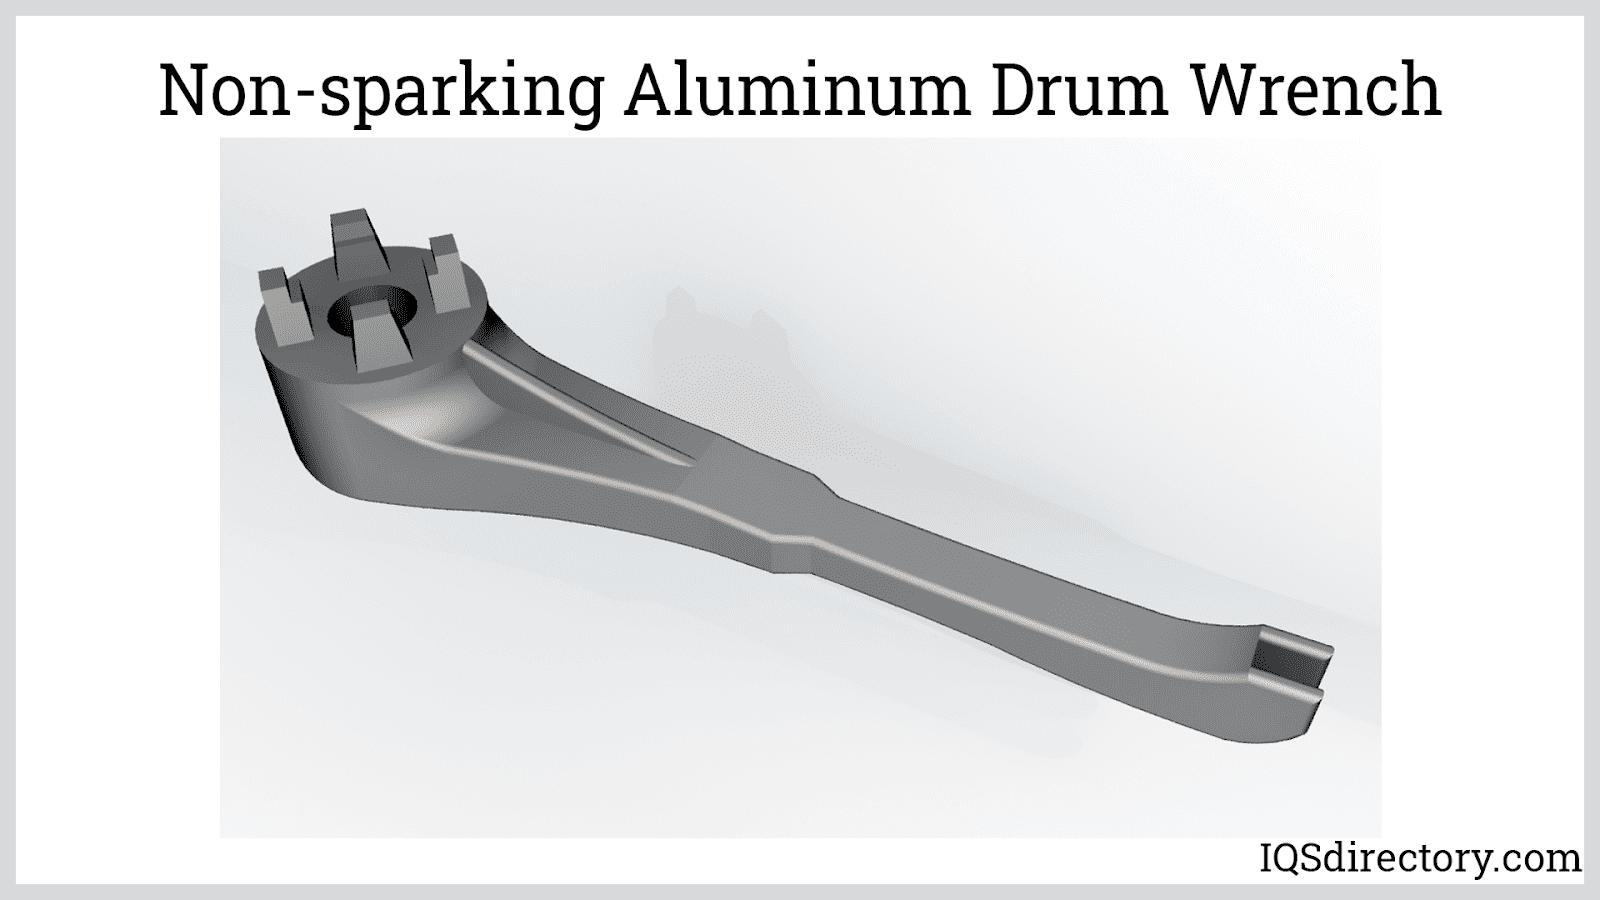 Non-sparking Aluminum Drum Wrench